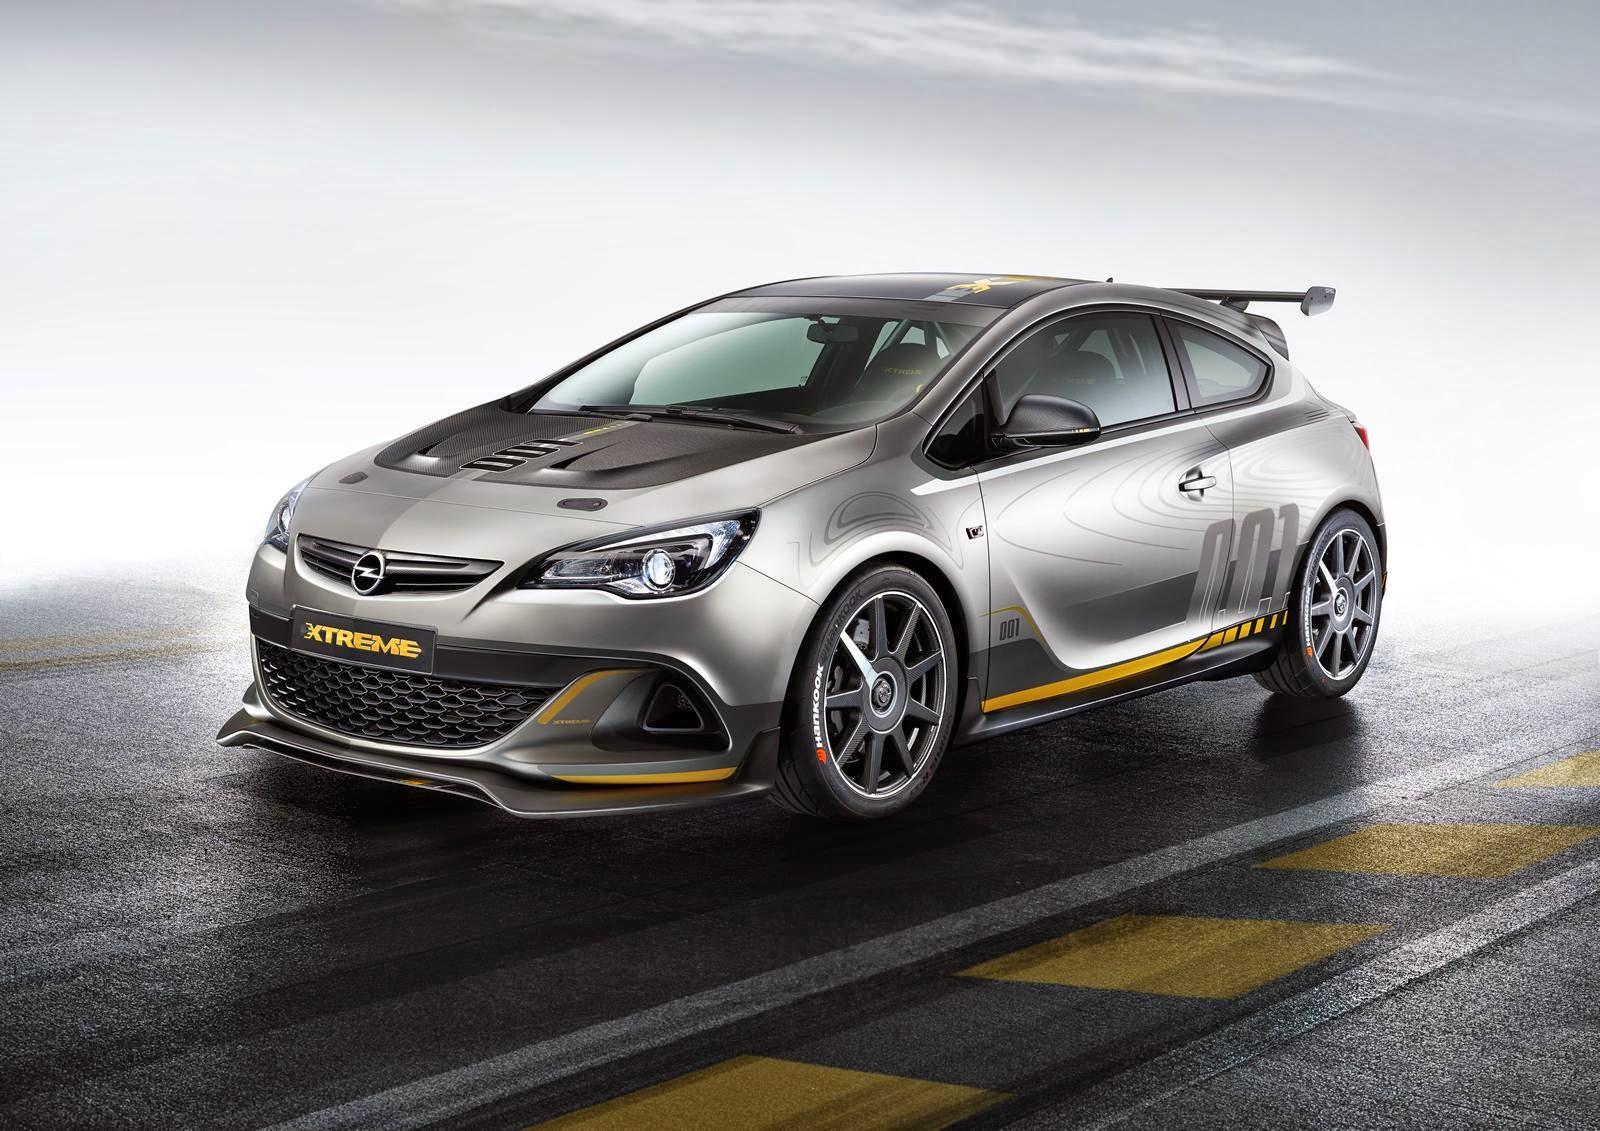 [Resim: Opel+Astra+OPC+EXTREME+1.jpg]